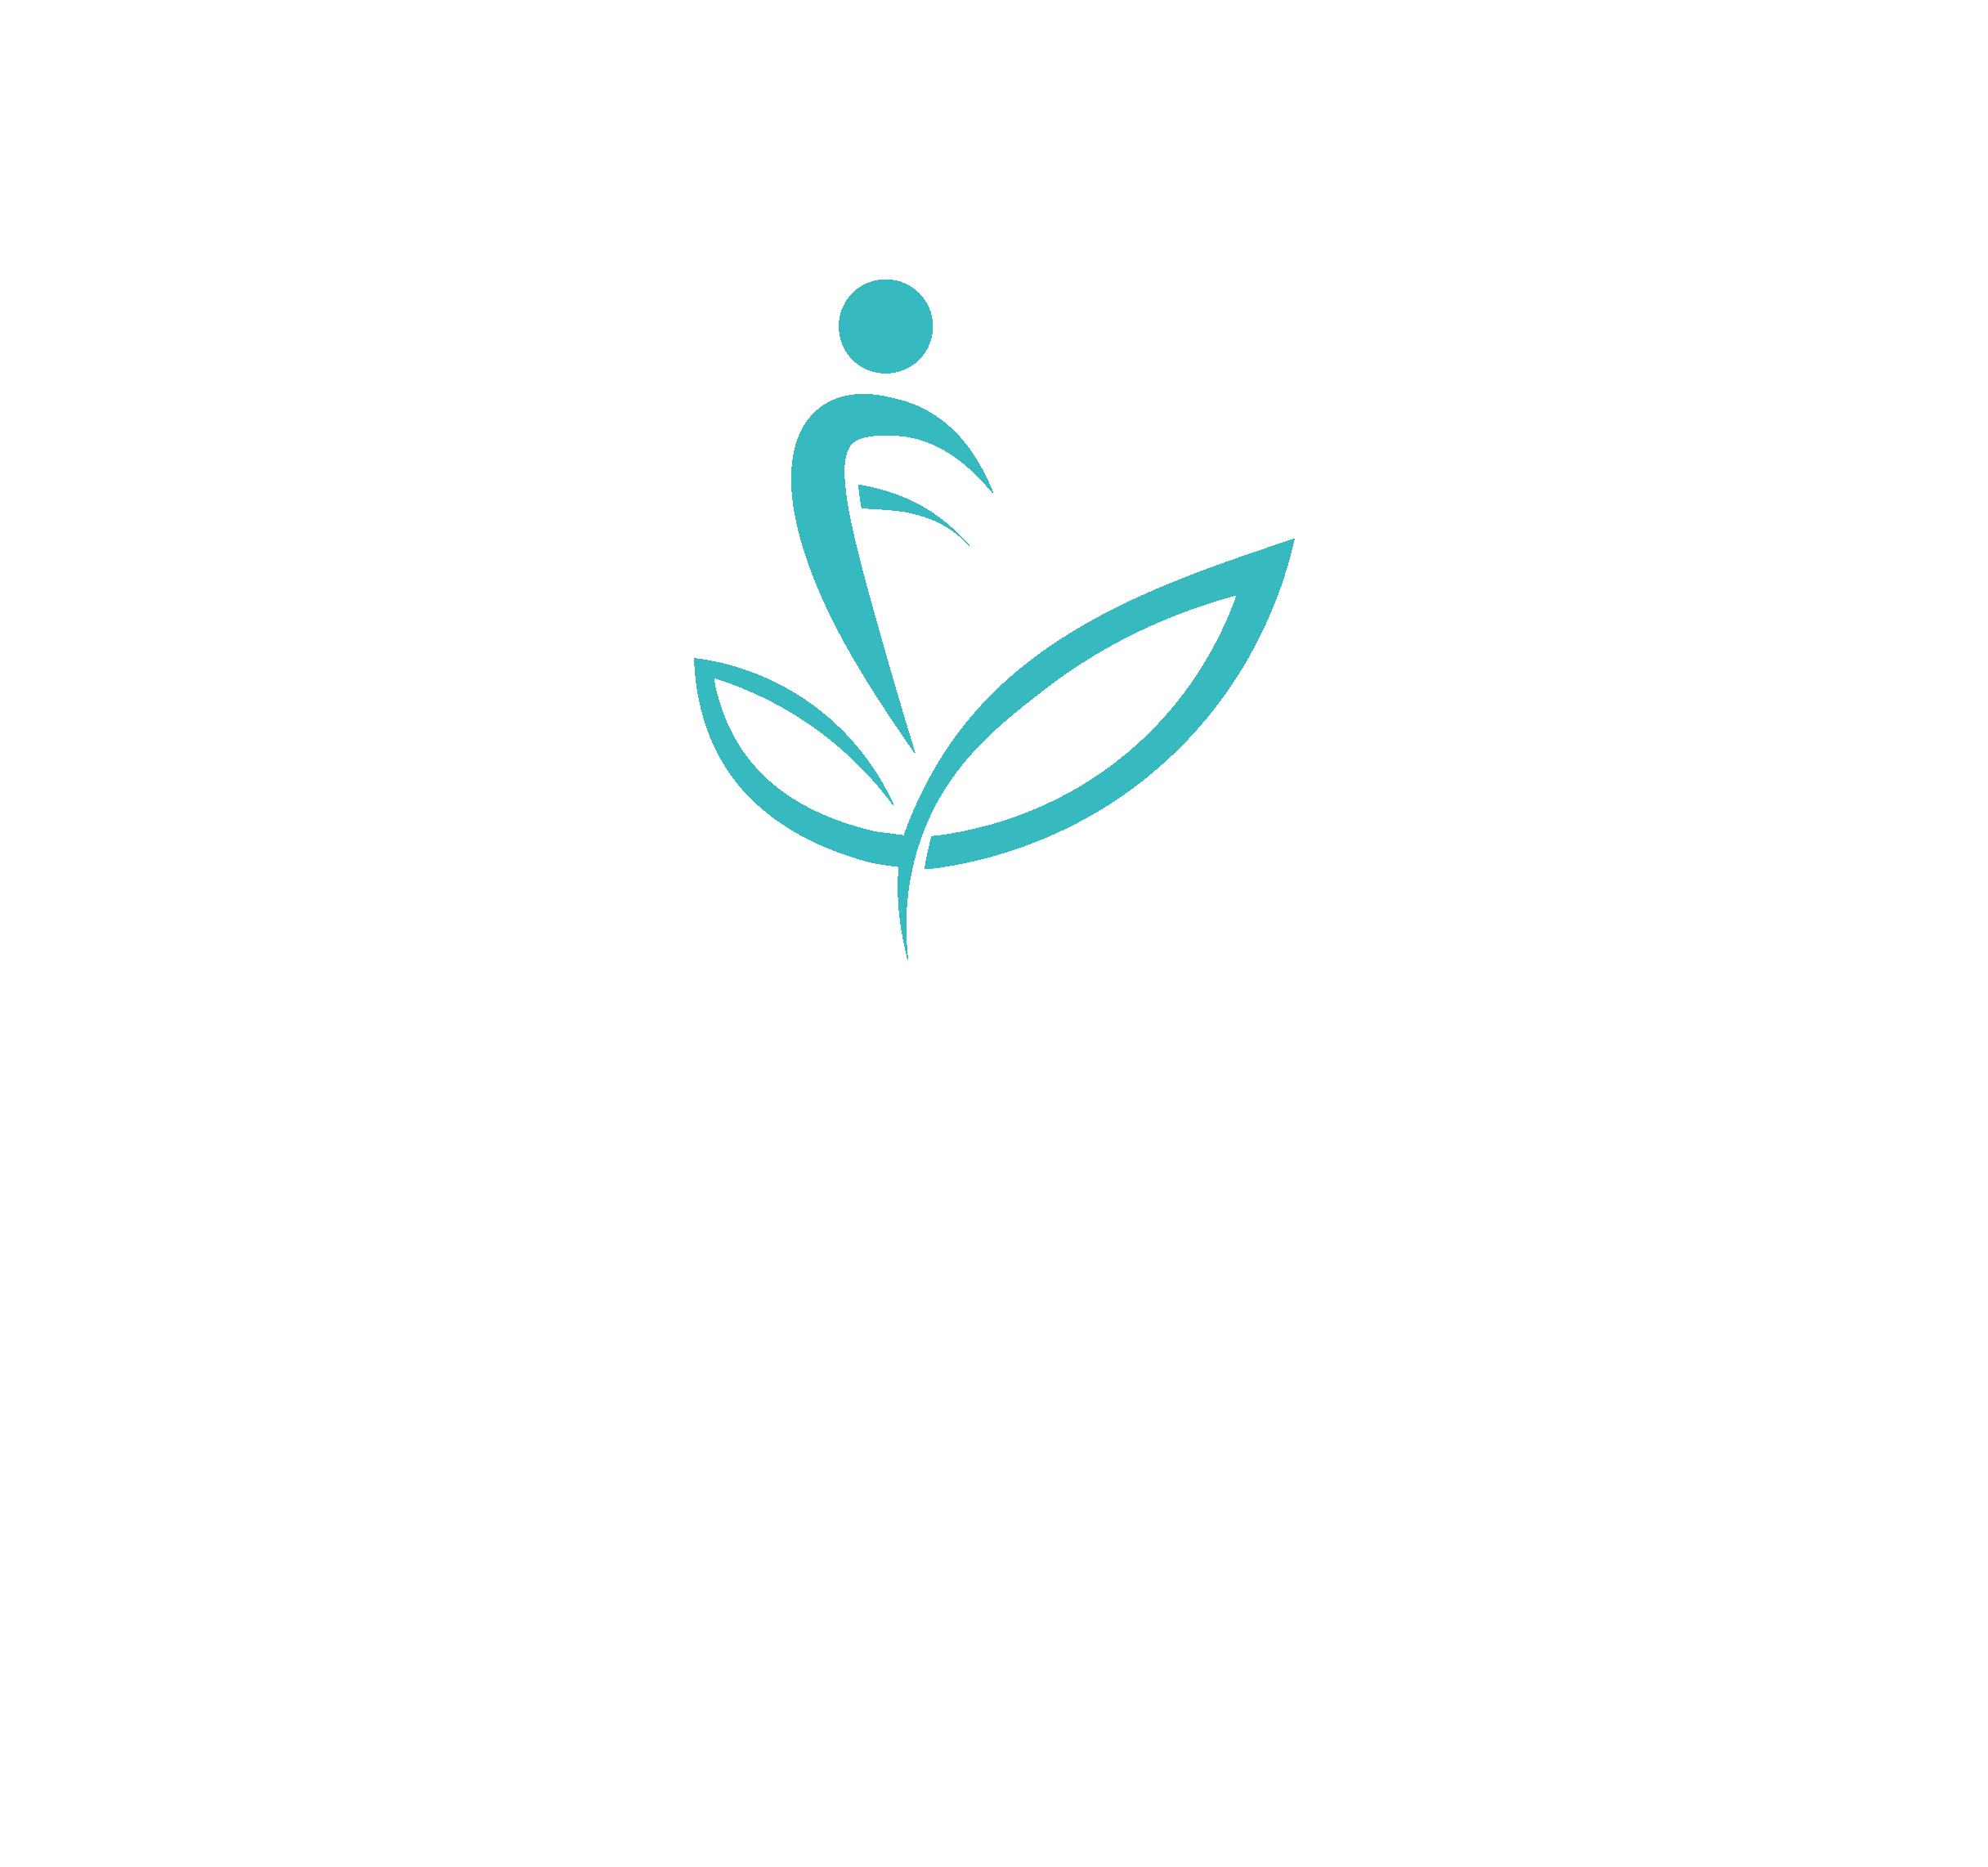 Flower Impact